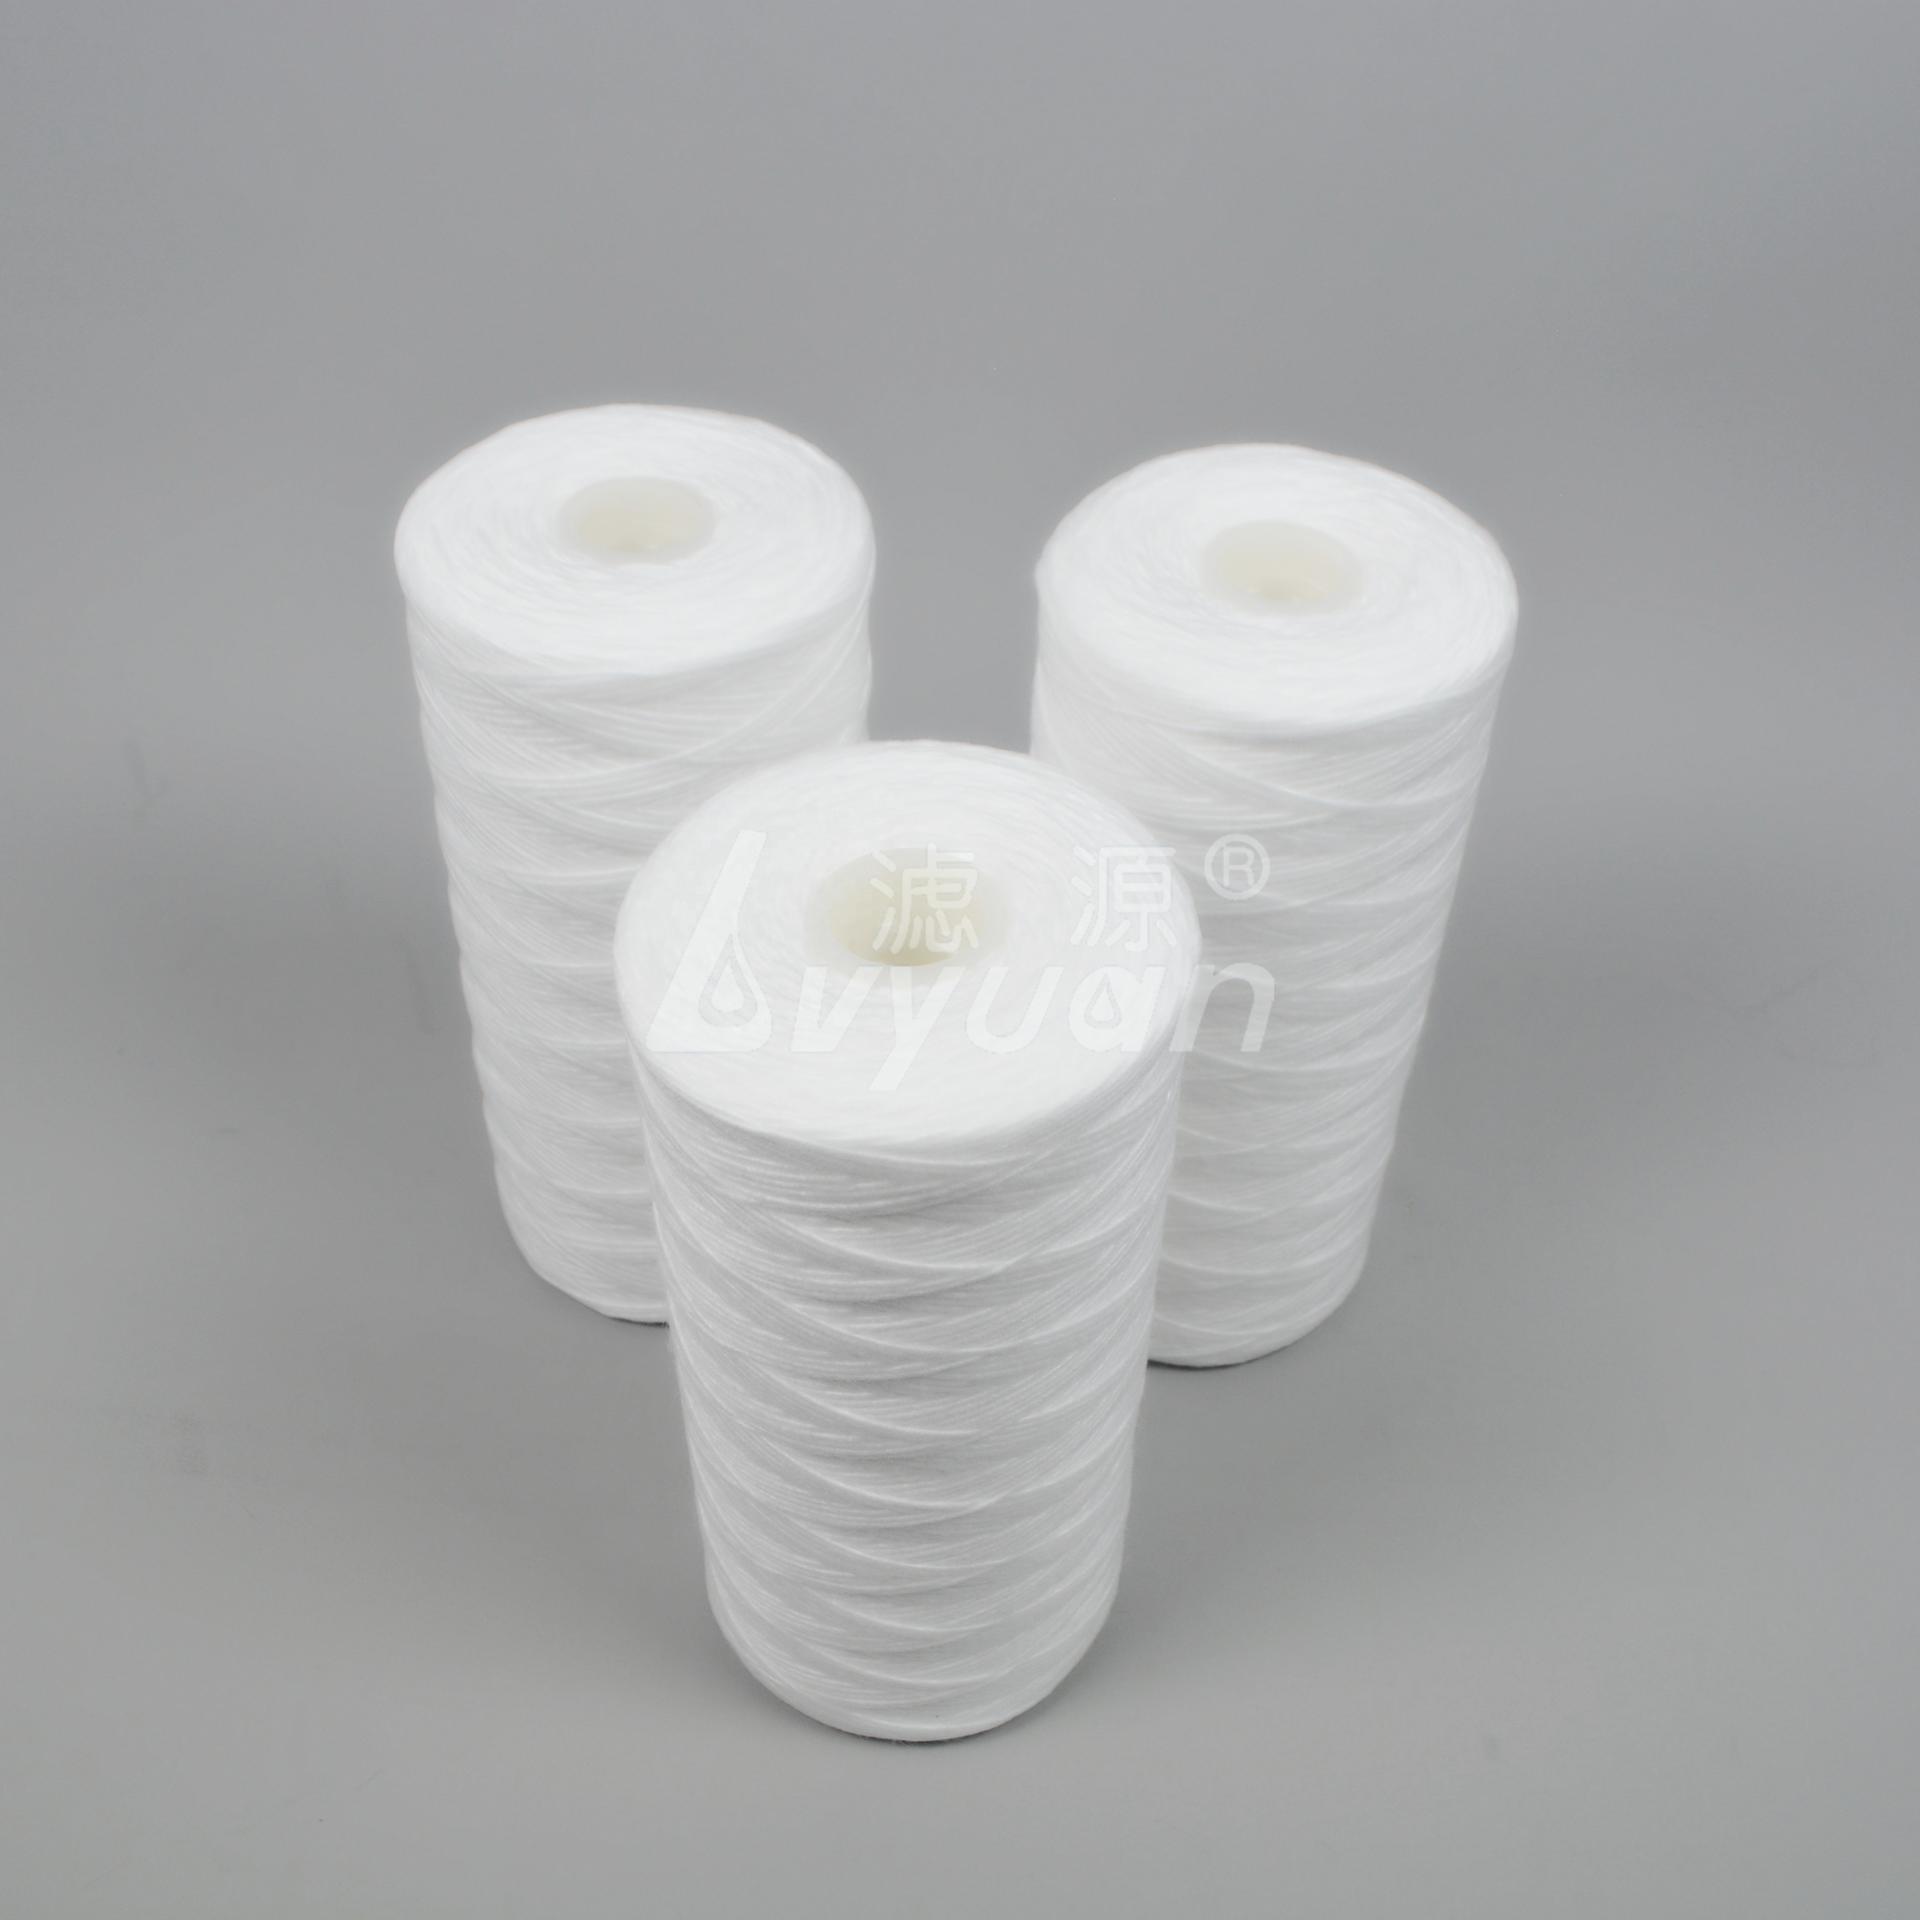 Jumbo 5 Micron Size 20 Inch X 4.5 Inch Sediment PP String Wound Water Cartridge spun yarn filter cartridge